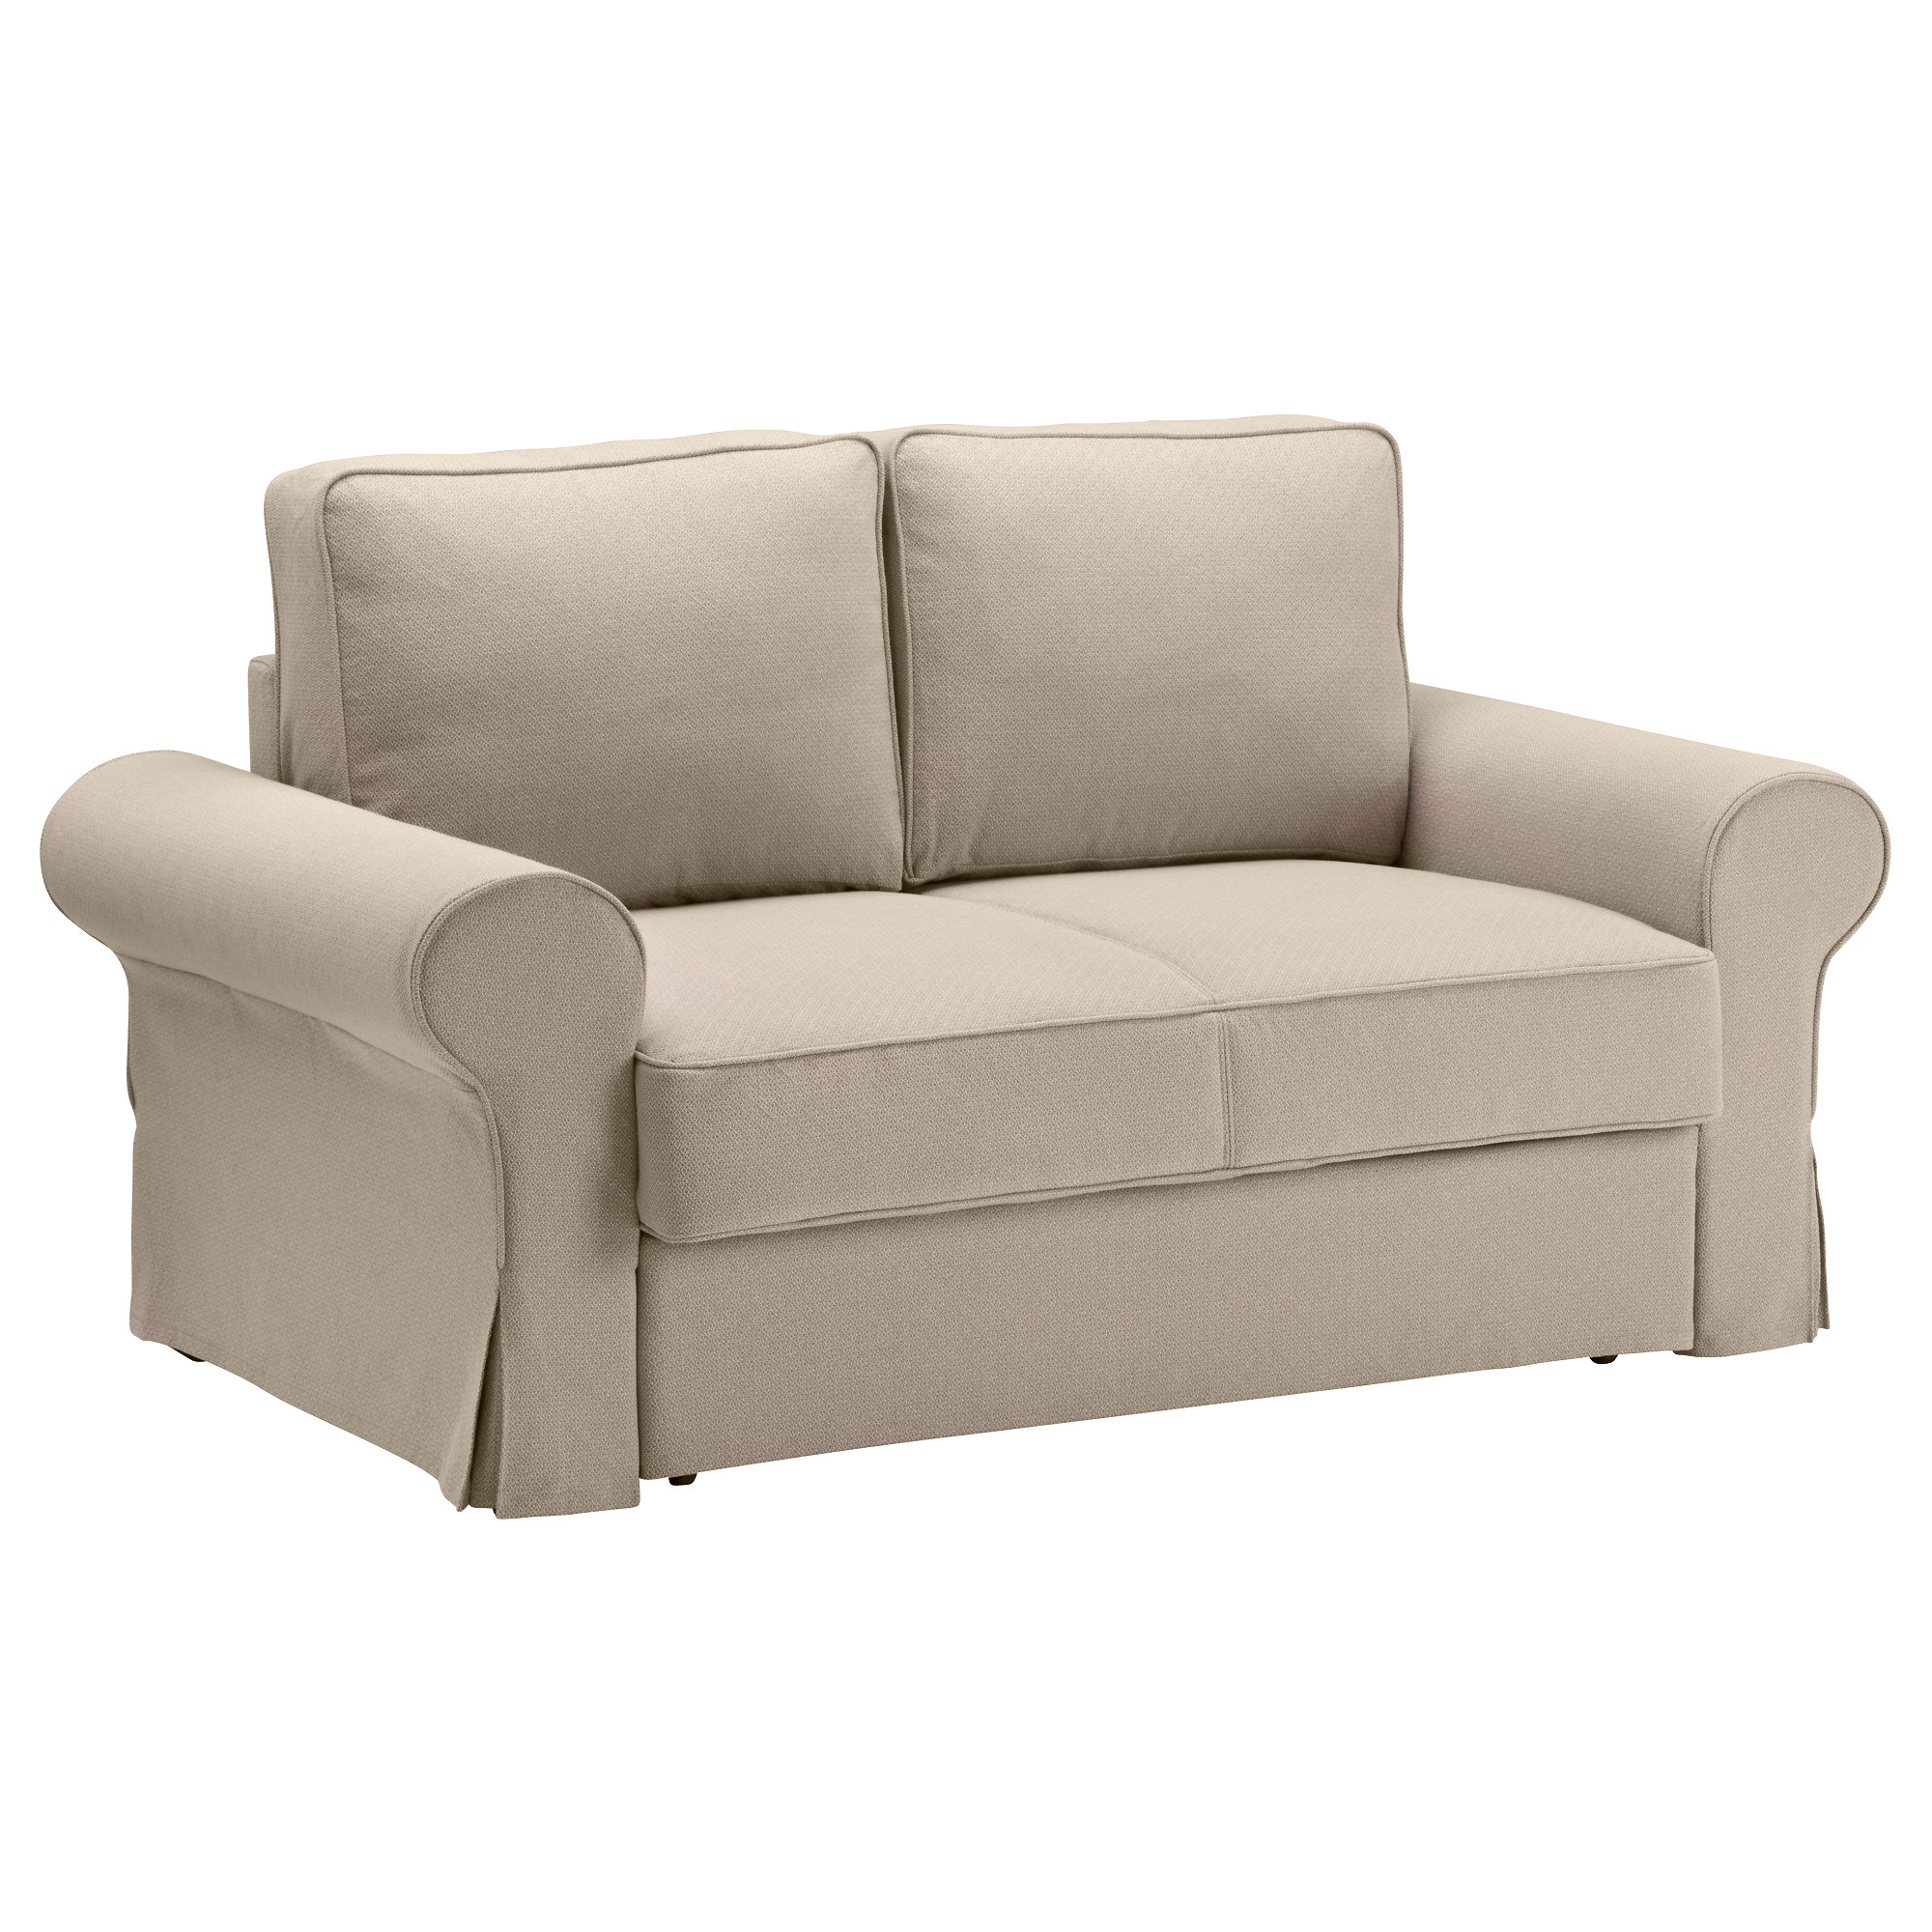 Sofa Cama Italiano Ikea Wddj sofà S Cama De Calidad Pra Online Ikea